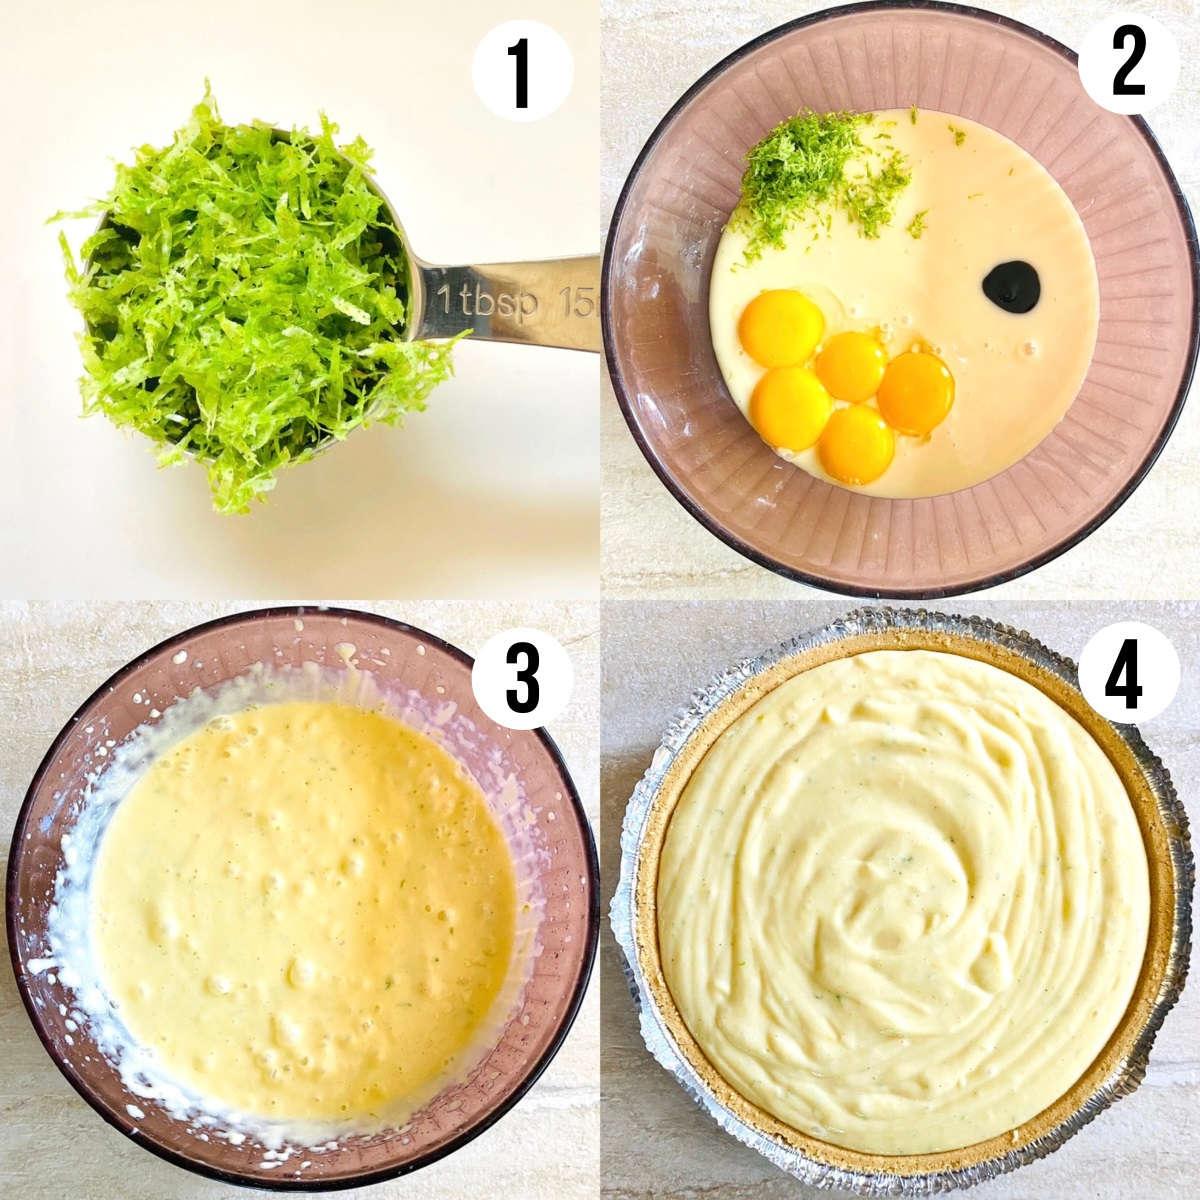 process shots 1 through 4 to make gluten free key lime pie